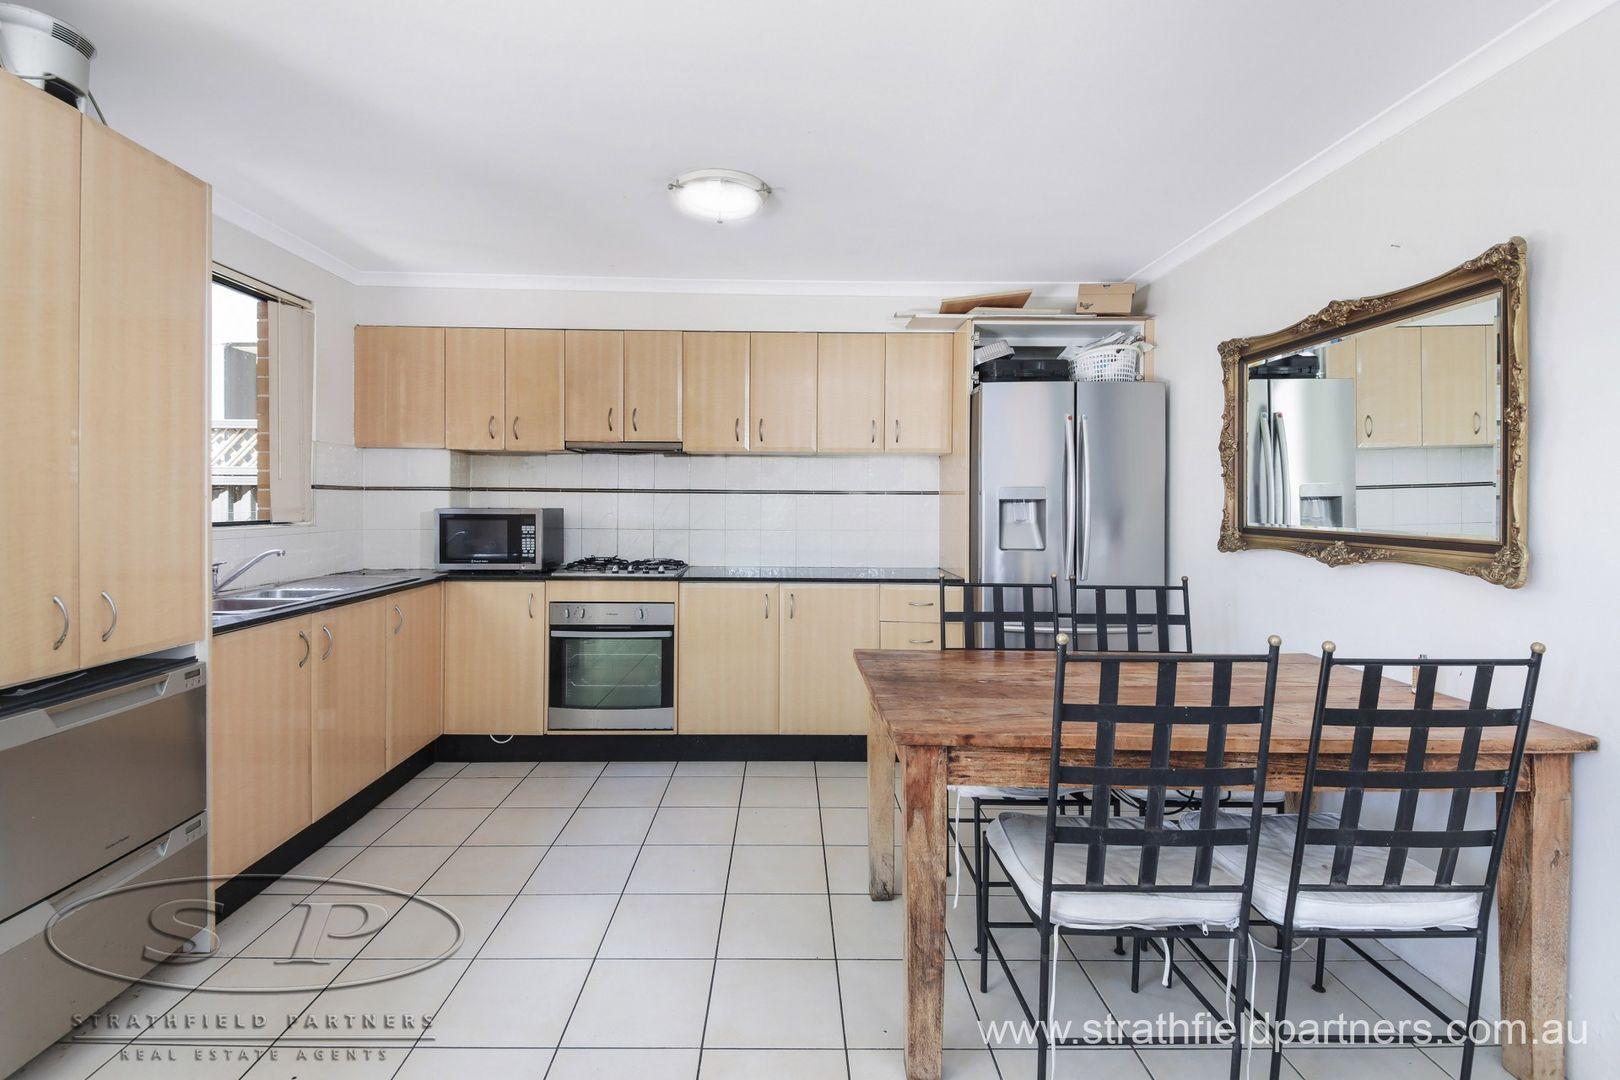 1/9 Anselm Street, Strathfield South NSW 2136, Image 1